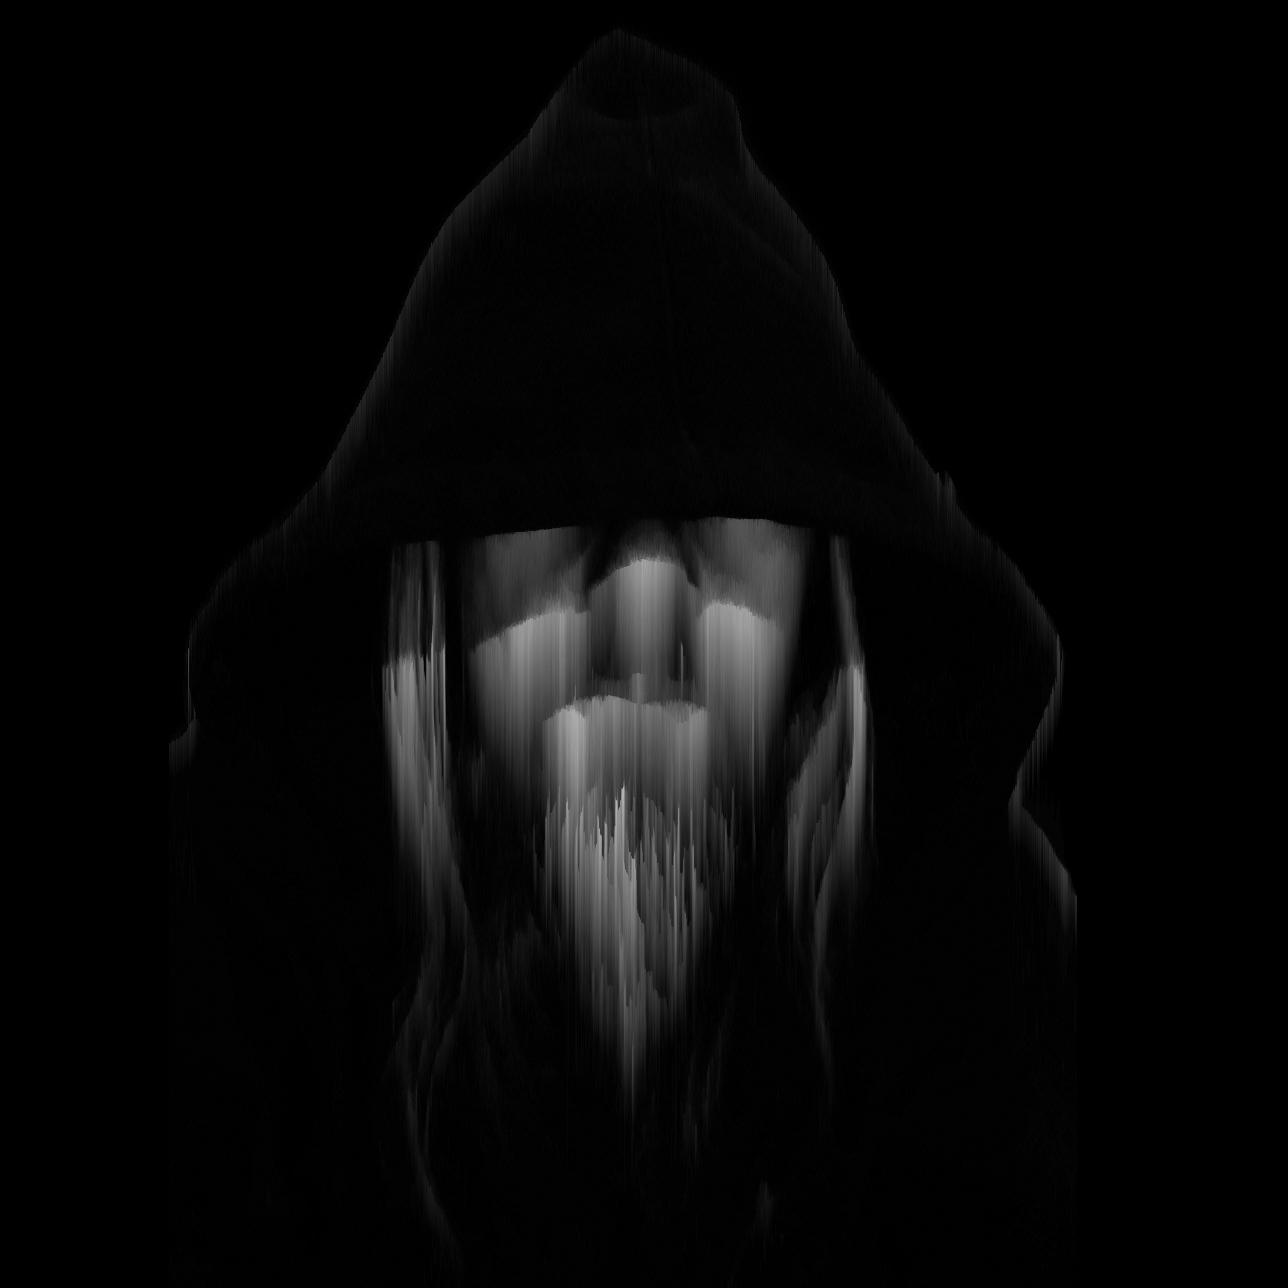 Vaeprism-Voide_PixelSort